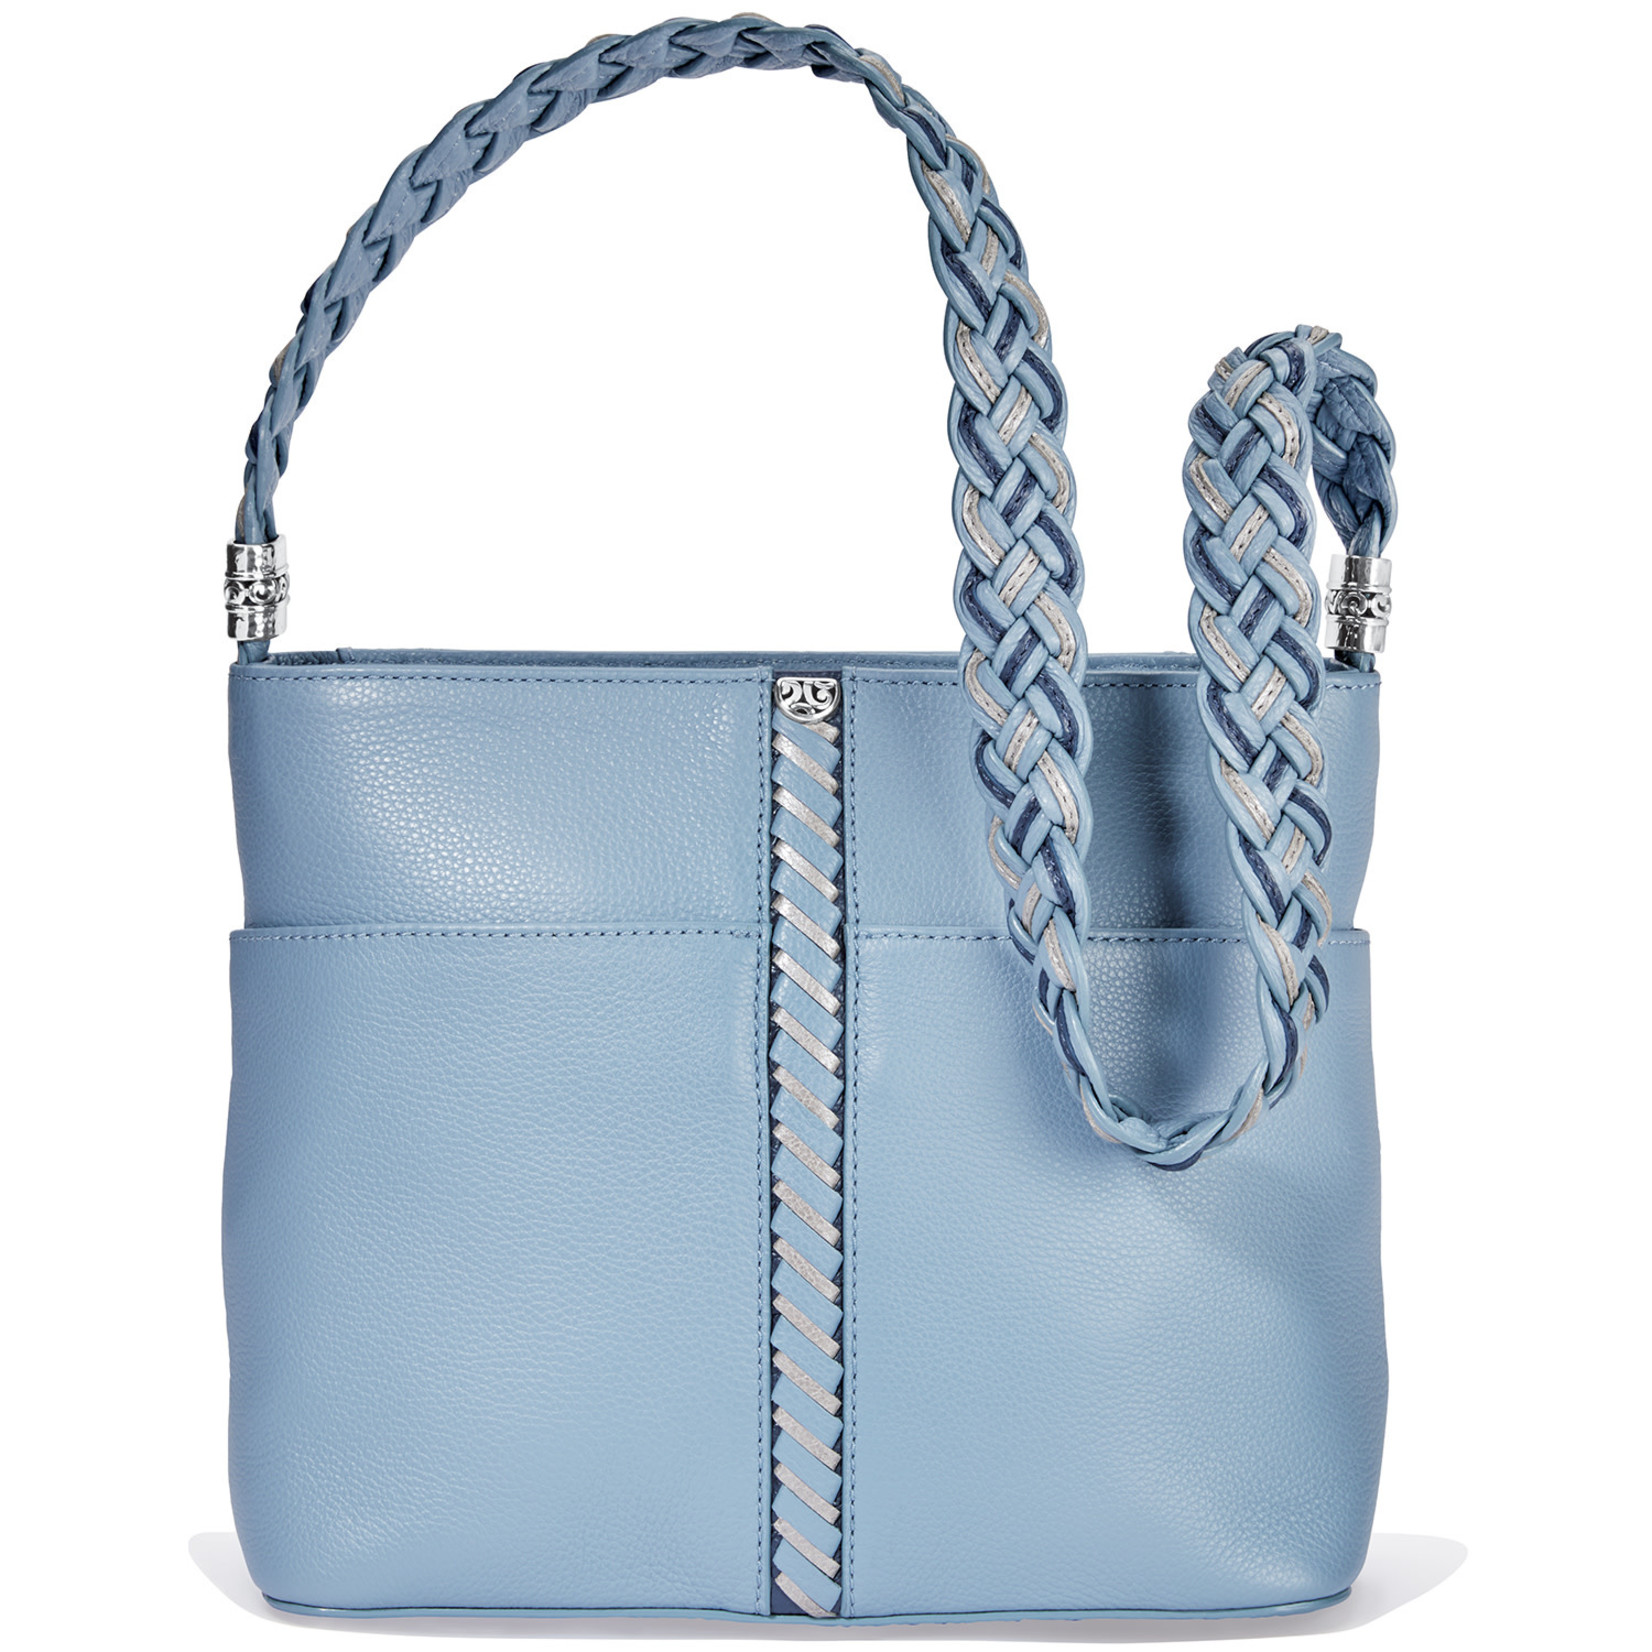 Beaumont Square Bucket Bag - Heaven Blue, OS